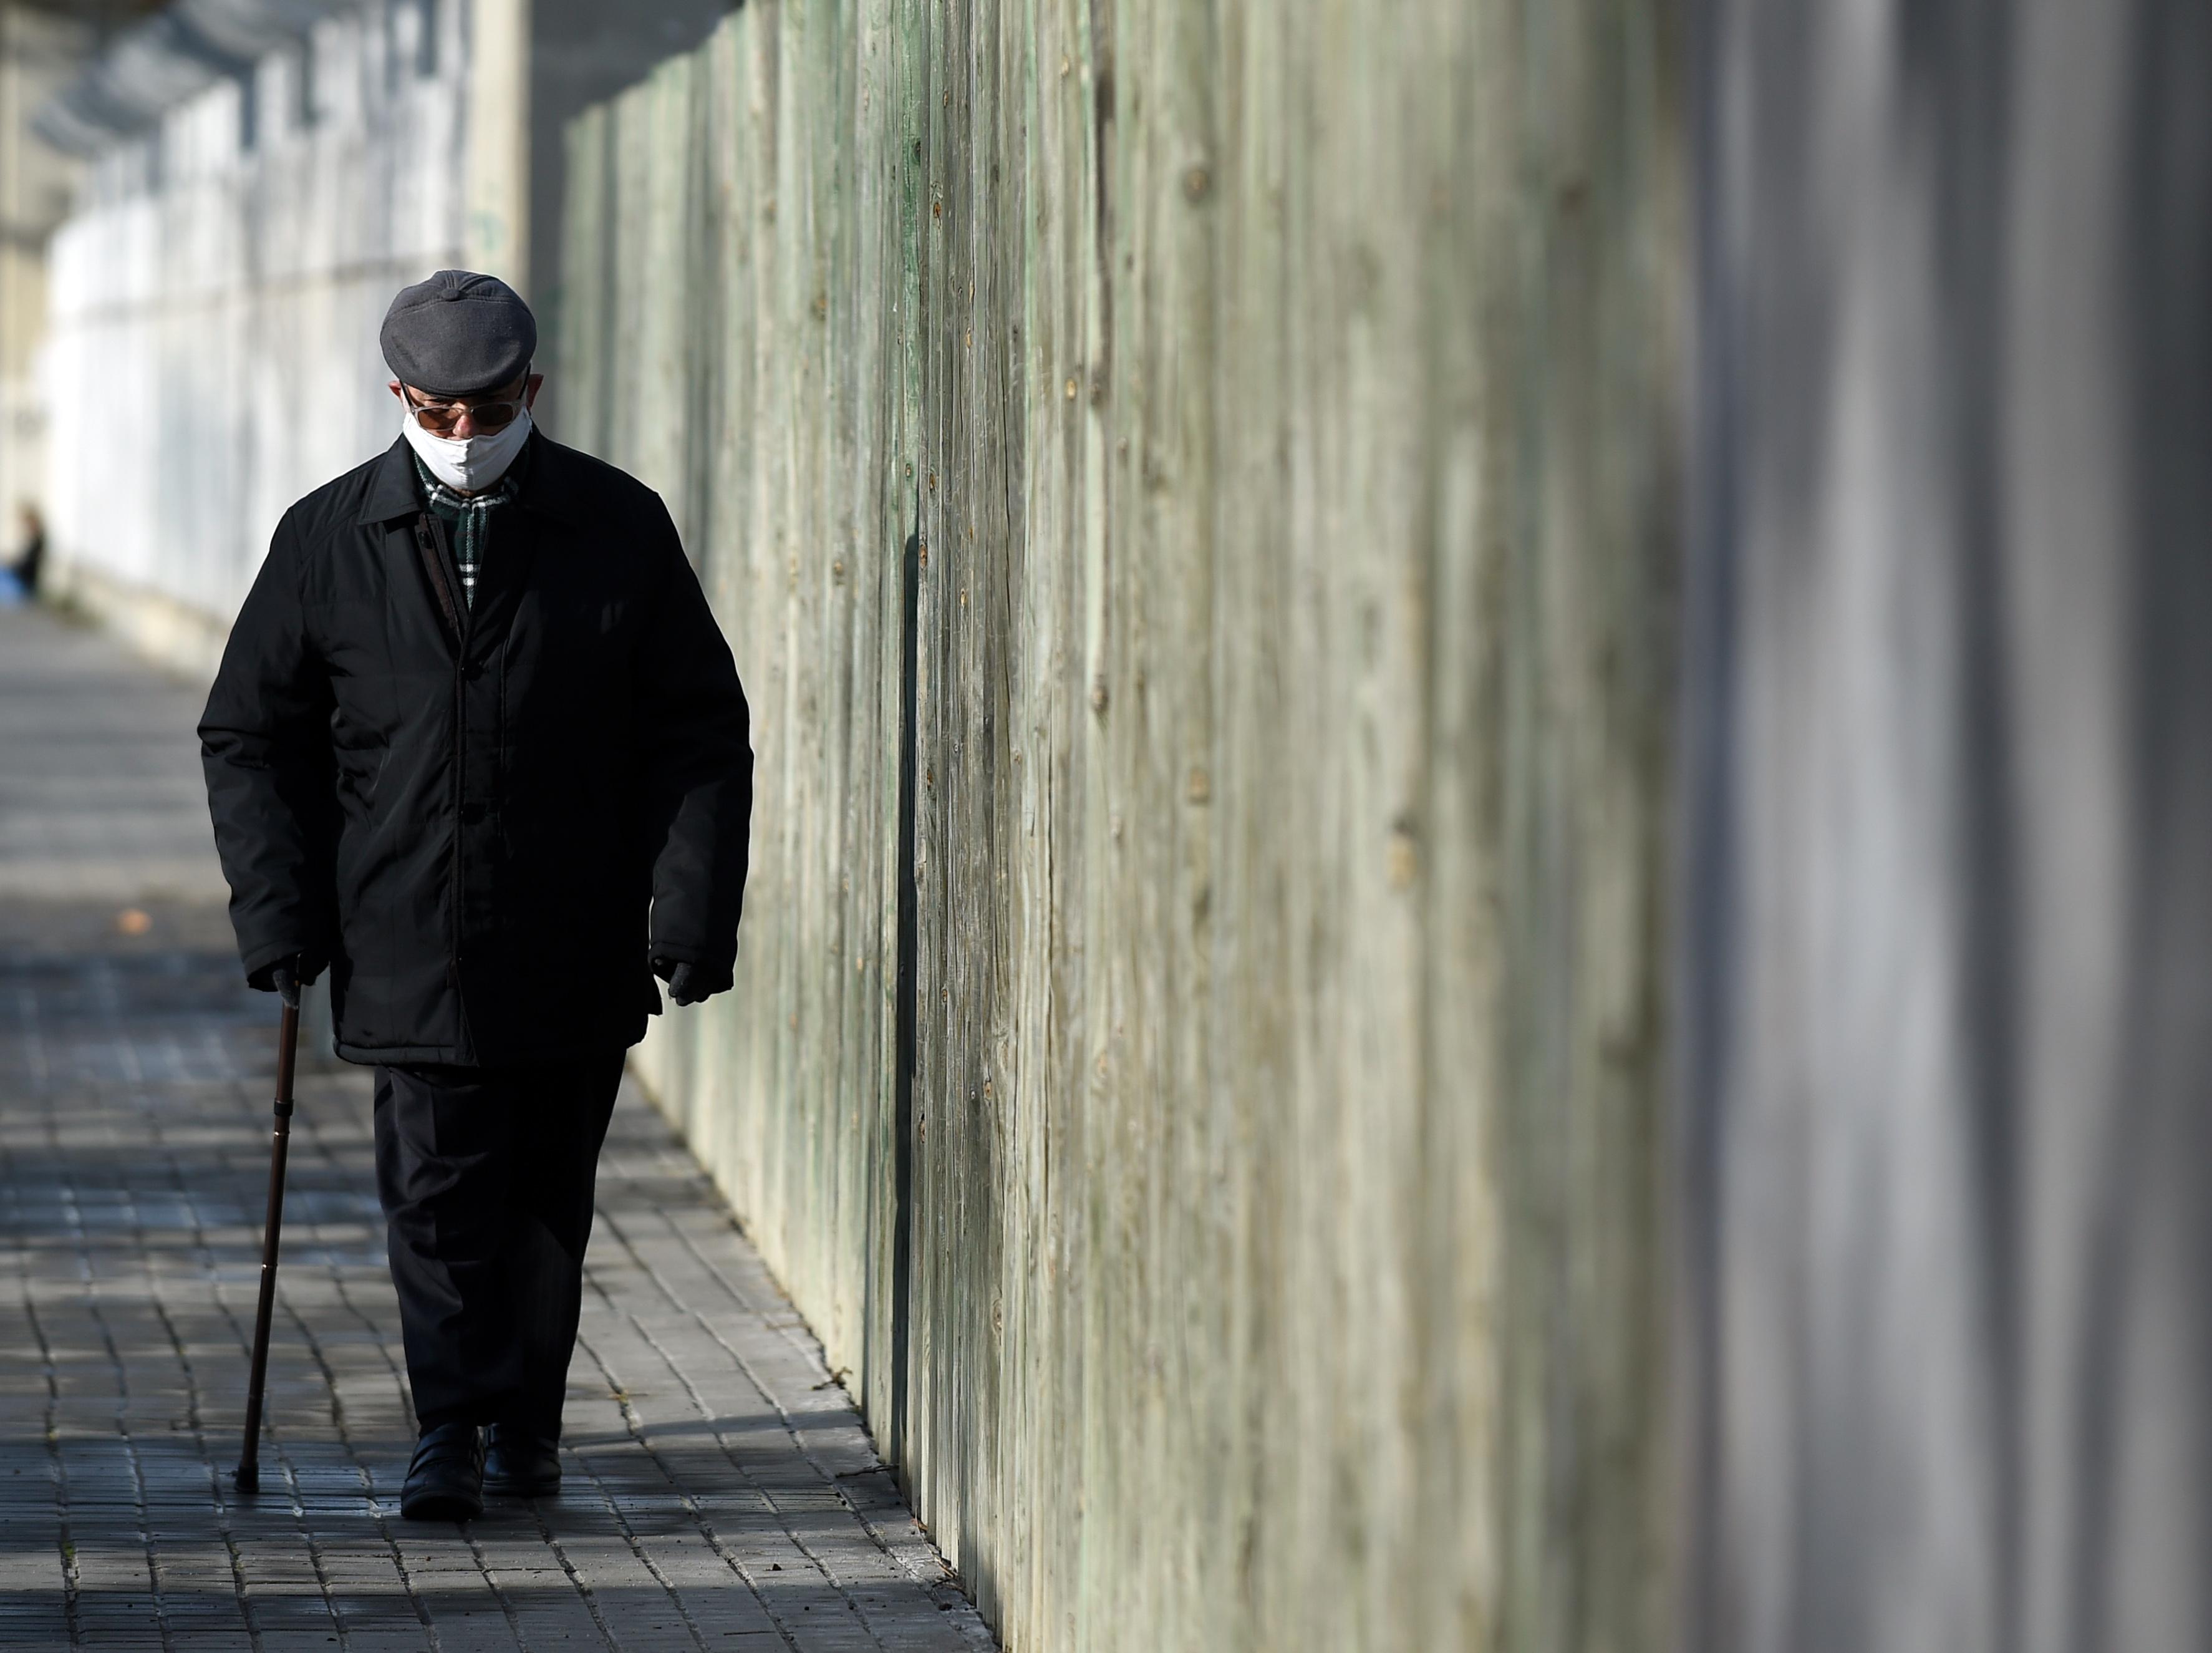 Un hombre con mascarilla camina en el municipio catalán de L'Hospitalet de Llobregat, en España.